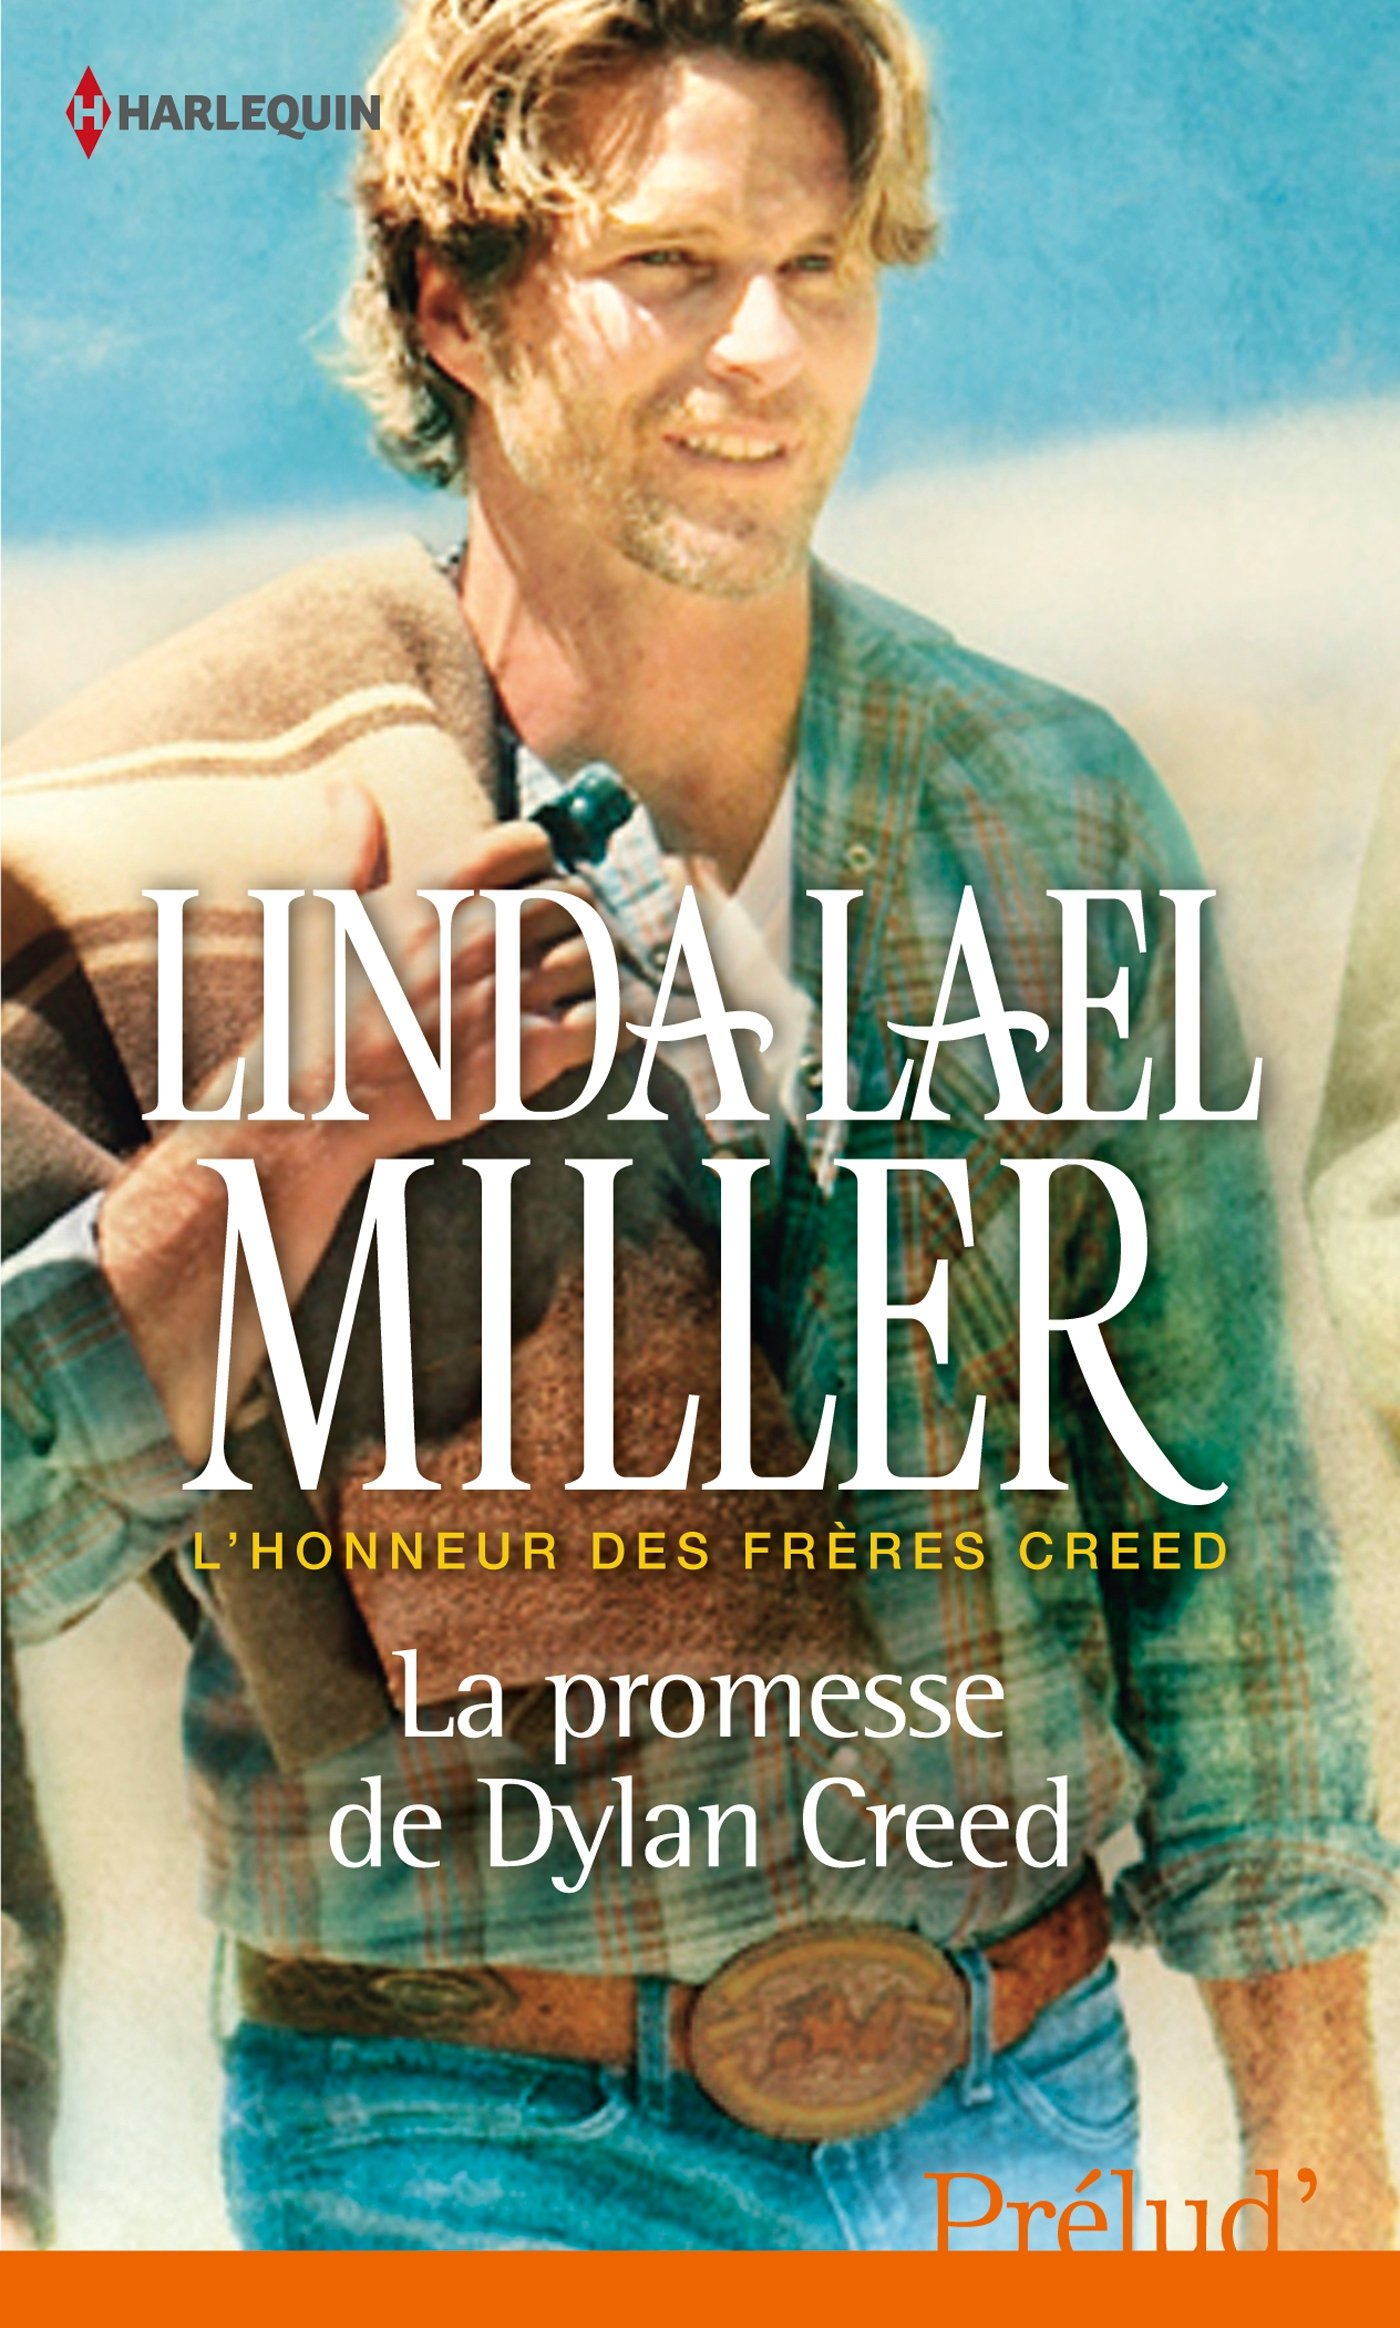 La promesse de Dylan Creed Poche – 1 juin 2013 Linda Lael Miller Harlequin 2280283719 Littérature sentimentale